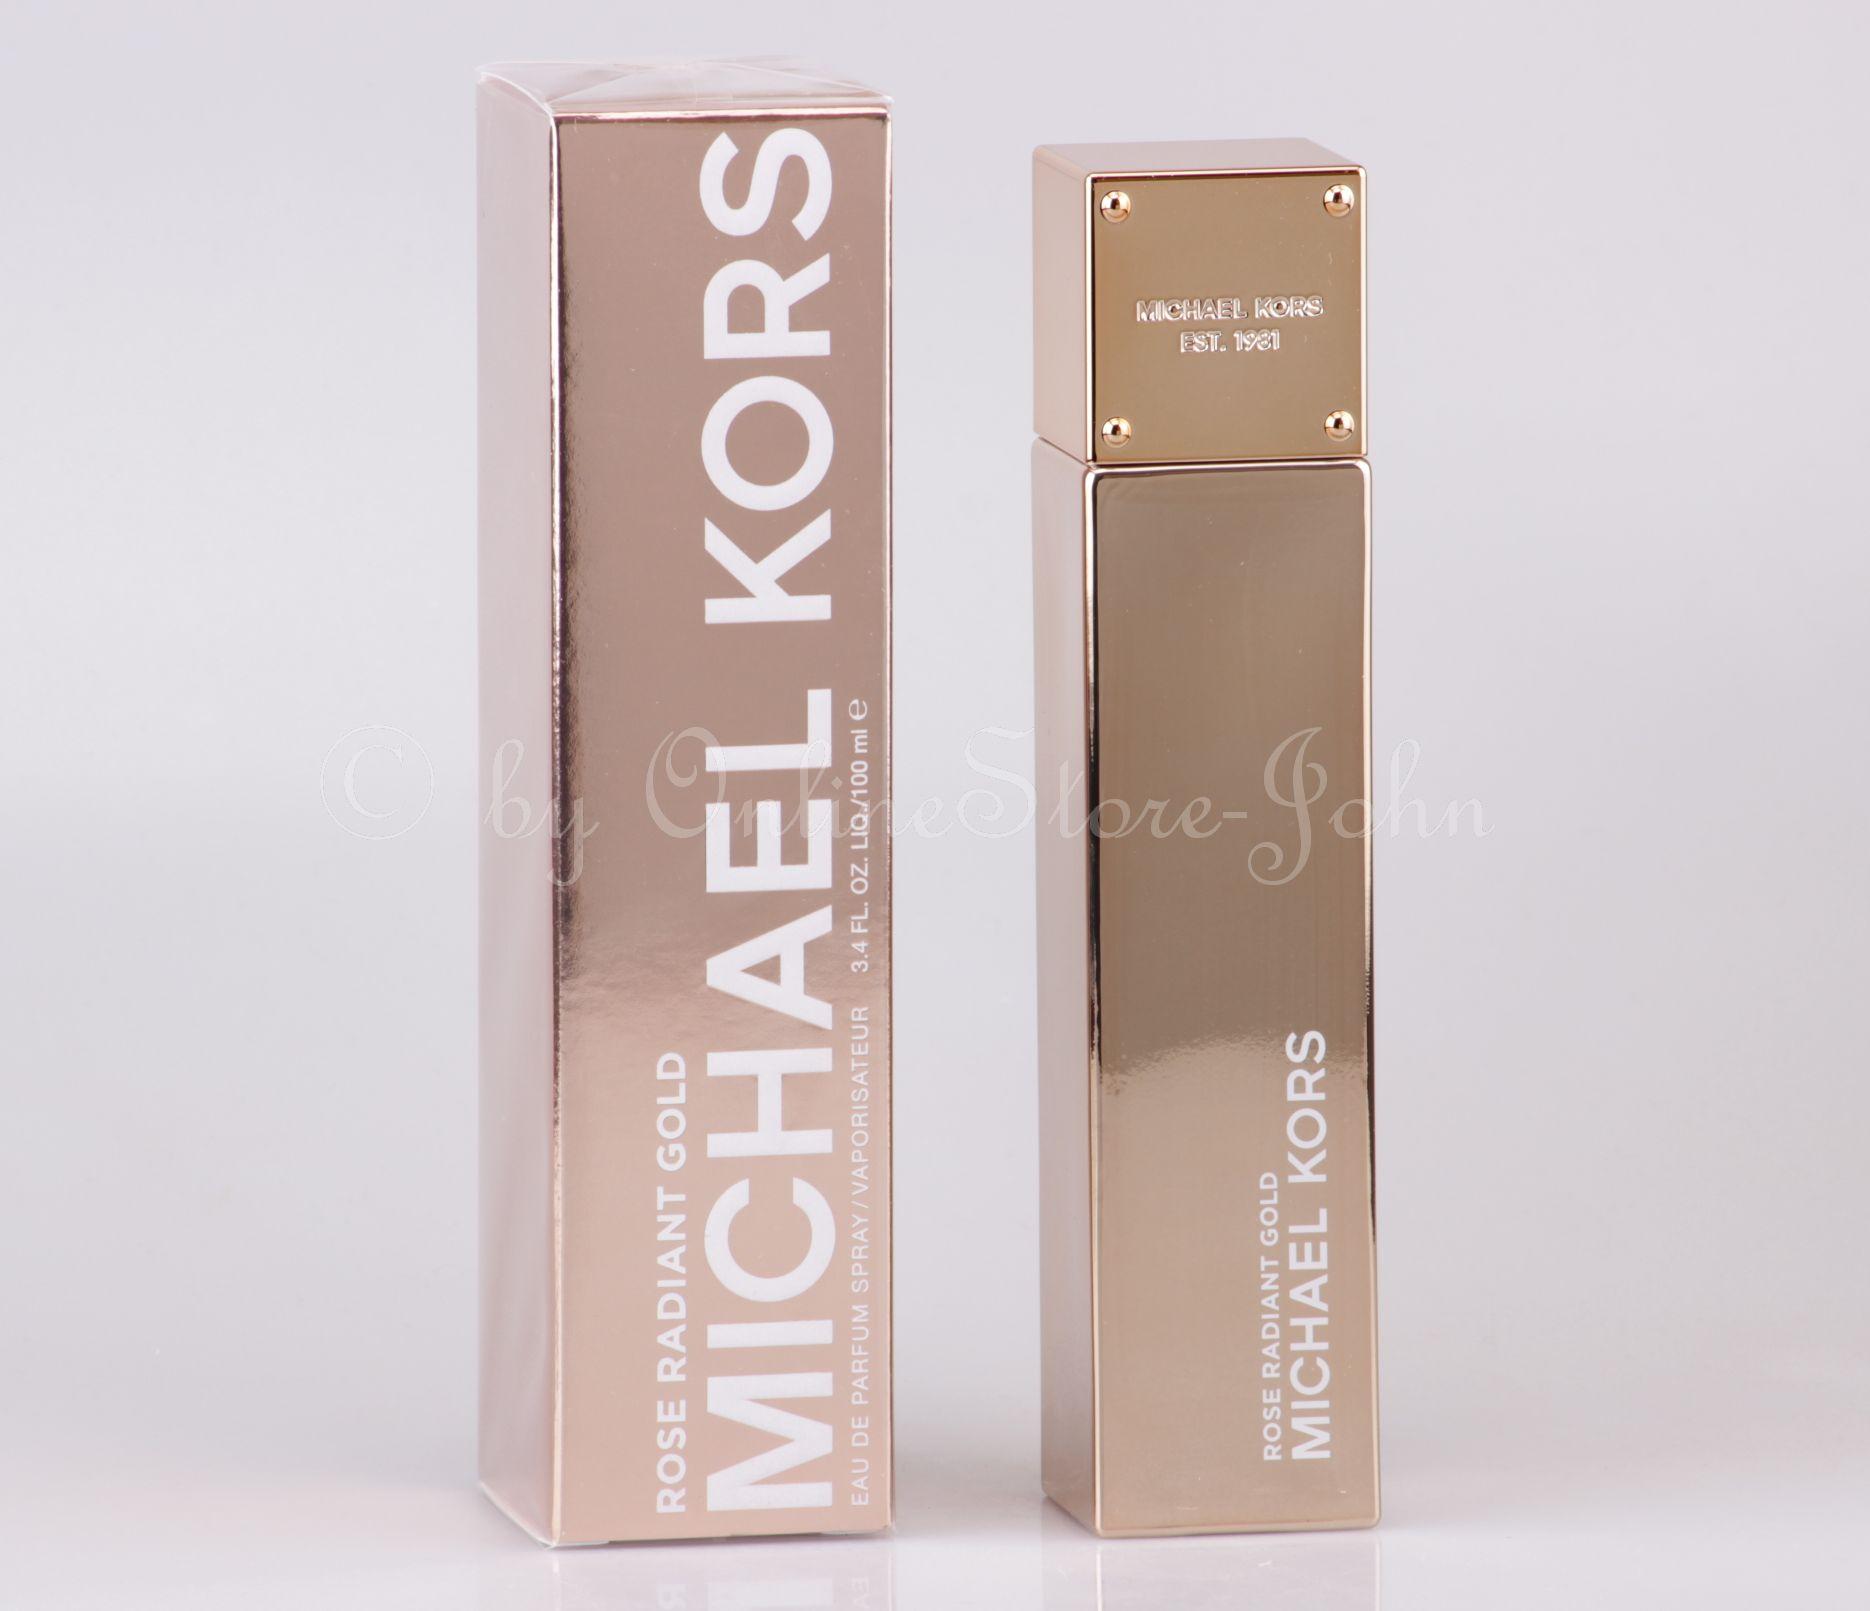 michael kors rose radiant gold 100ml edp eau de parfum. Black Bedroom Furniture Sets. Home Design Ideas